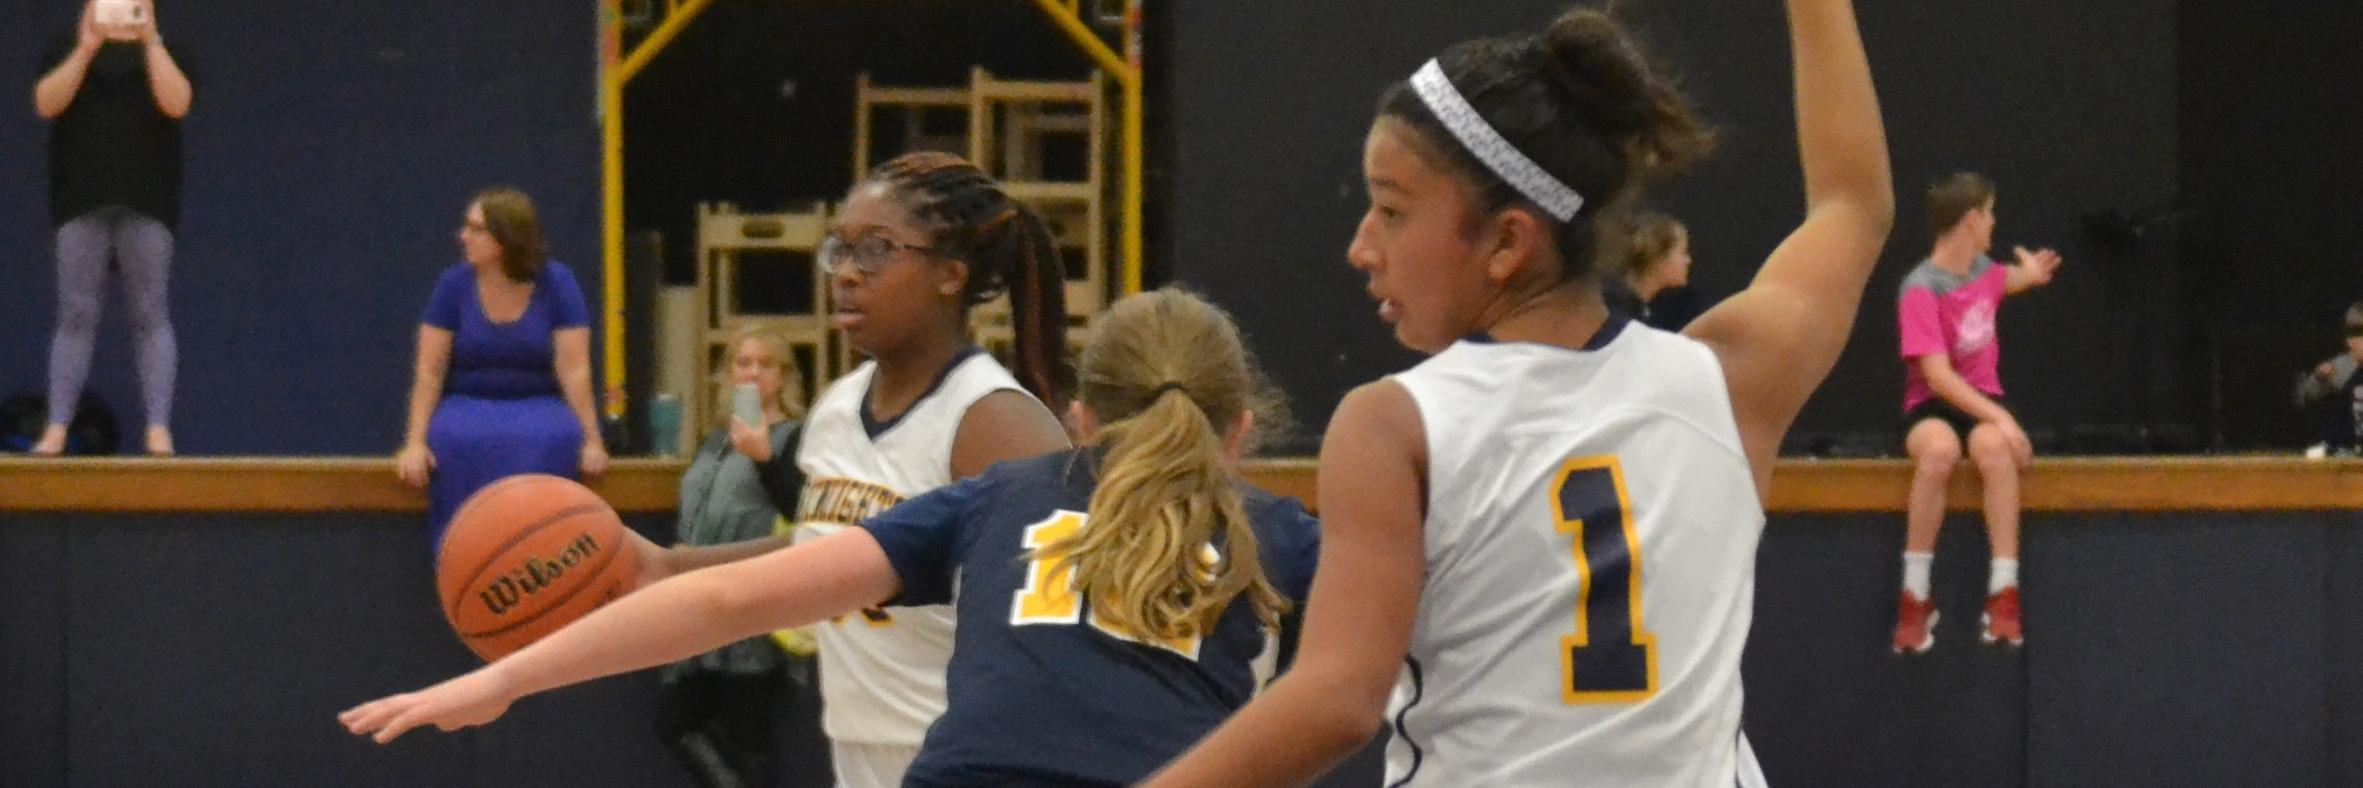 girls basketball game